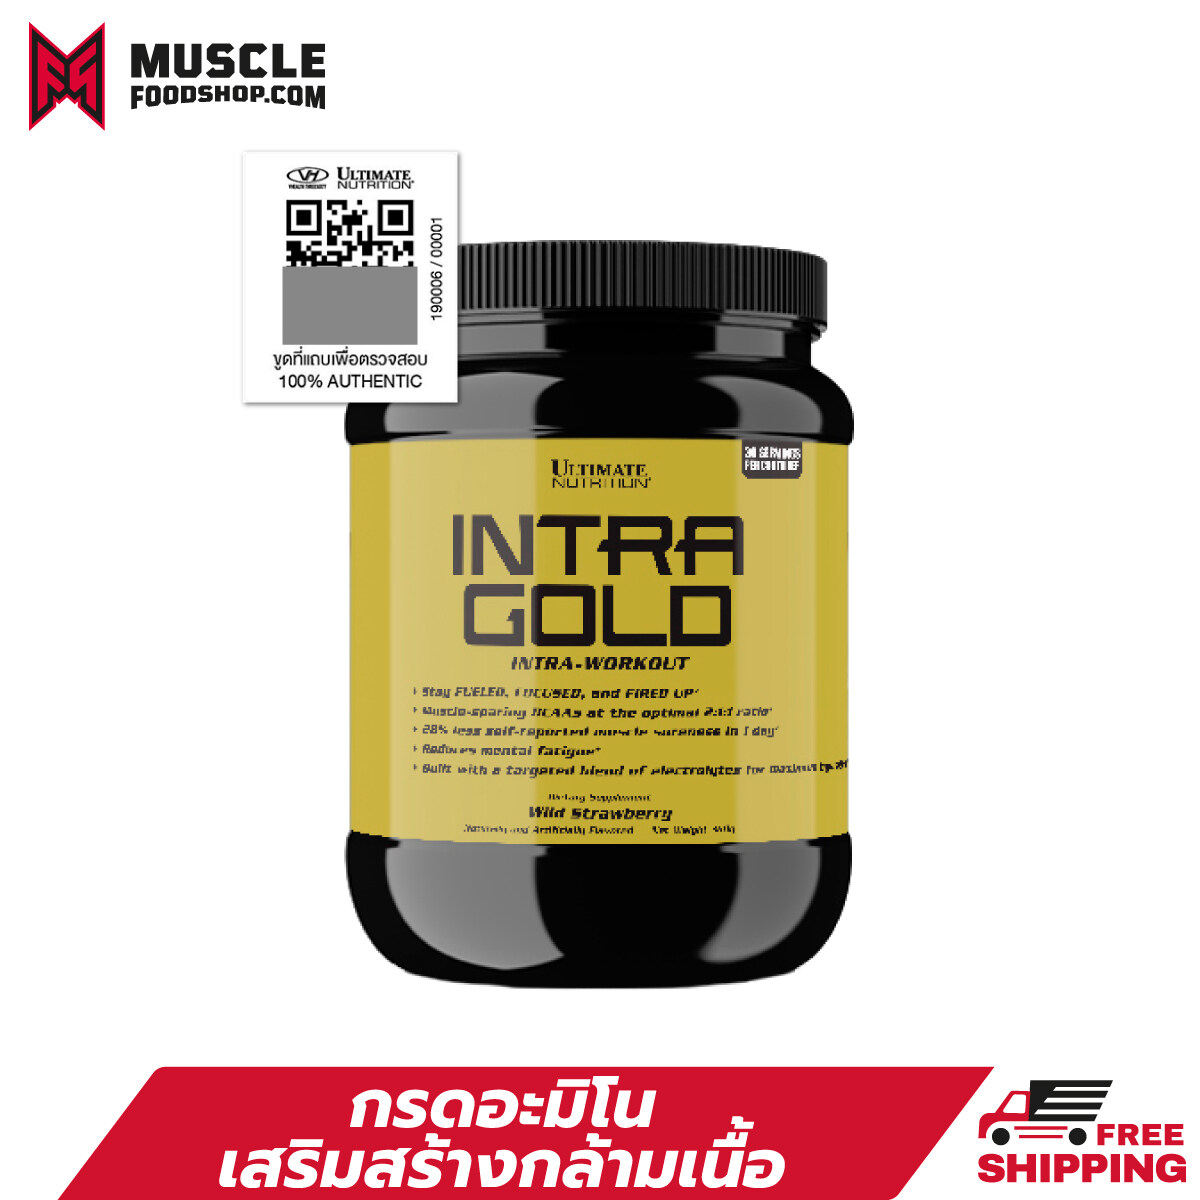 Ultimate Nutrition Intra Gold BCAA - 30 serving กรดอะมิโนเสริมสร้างกล้ามเนื้อ